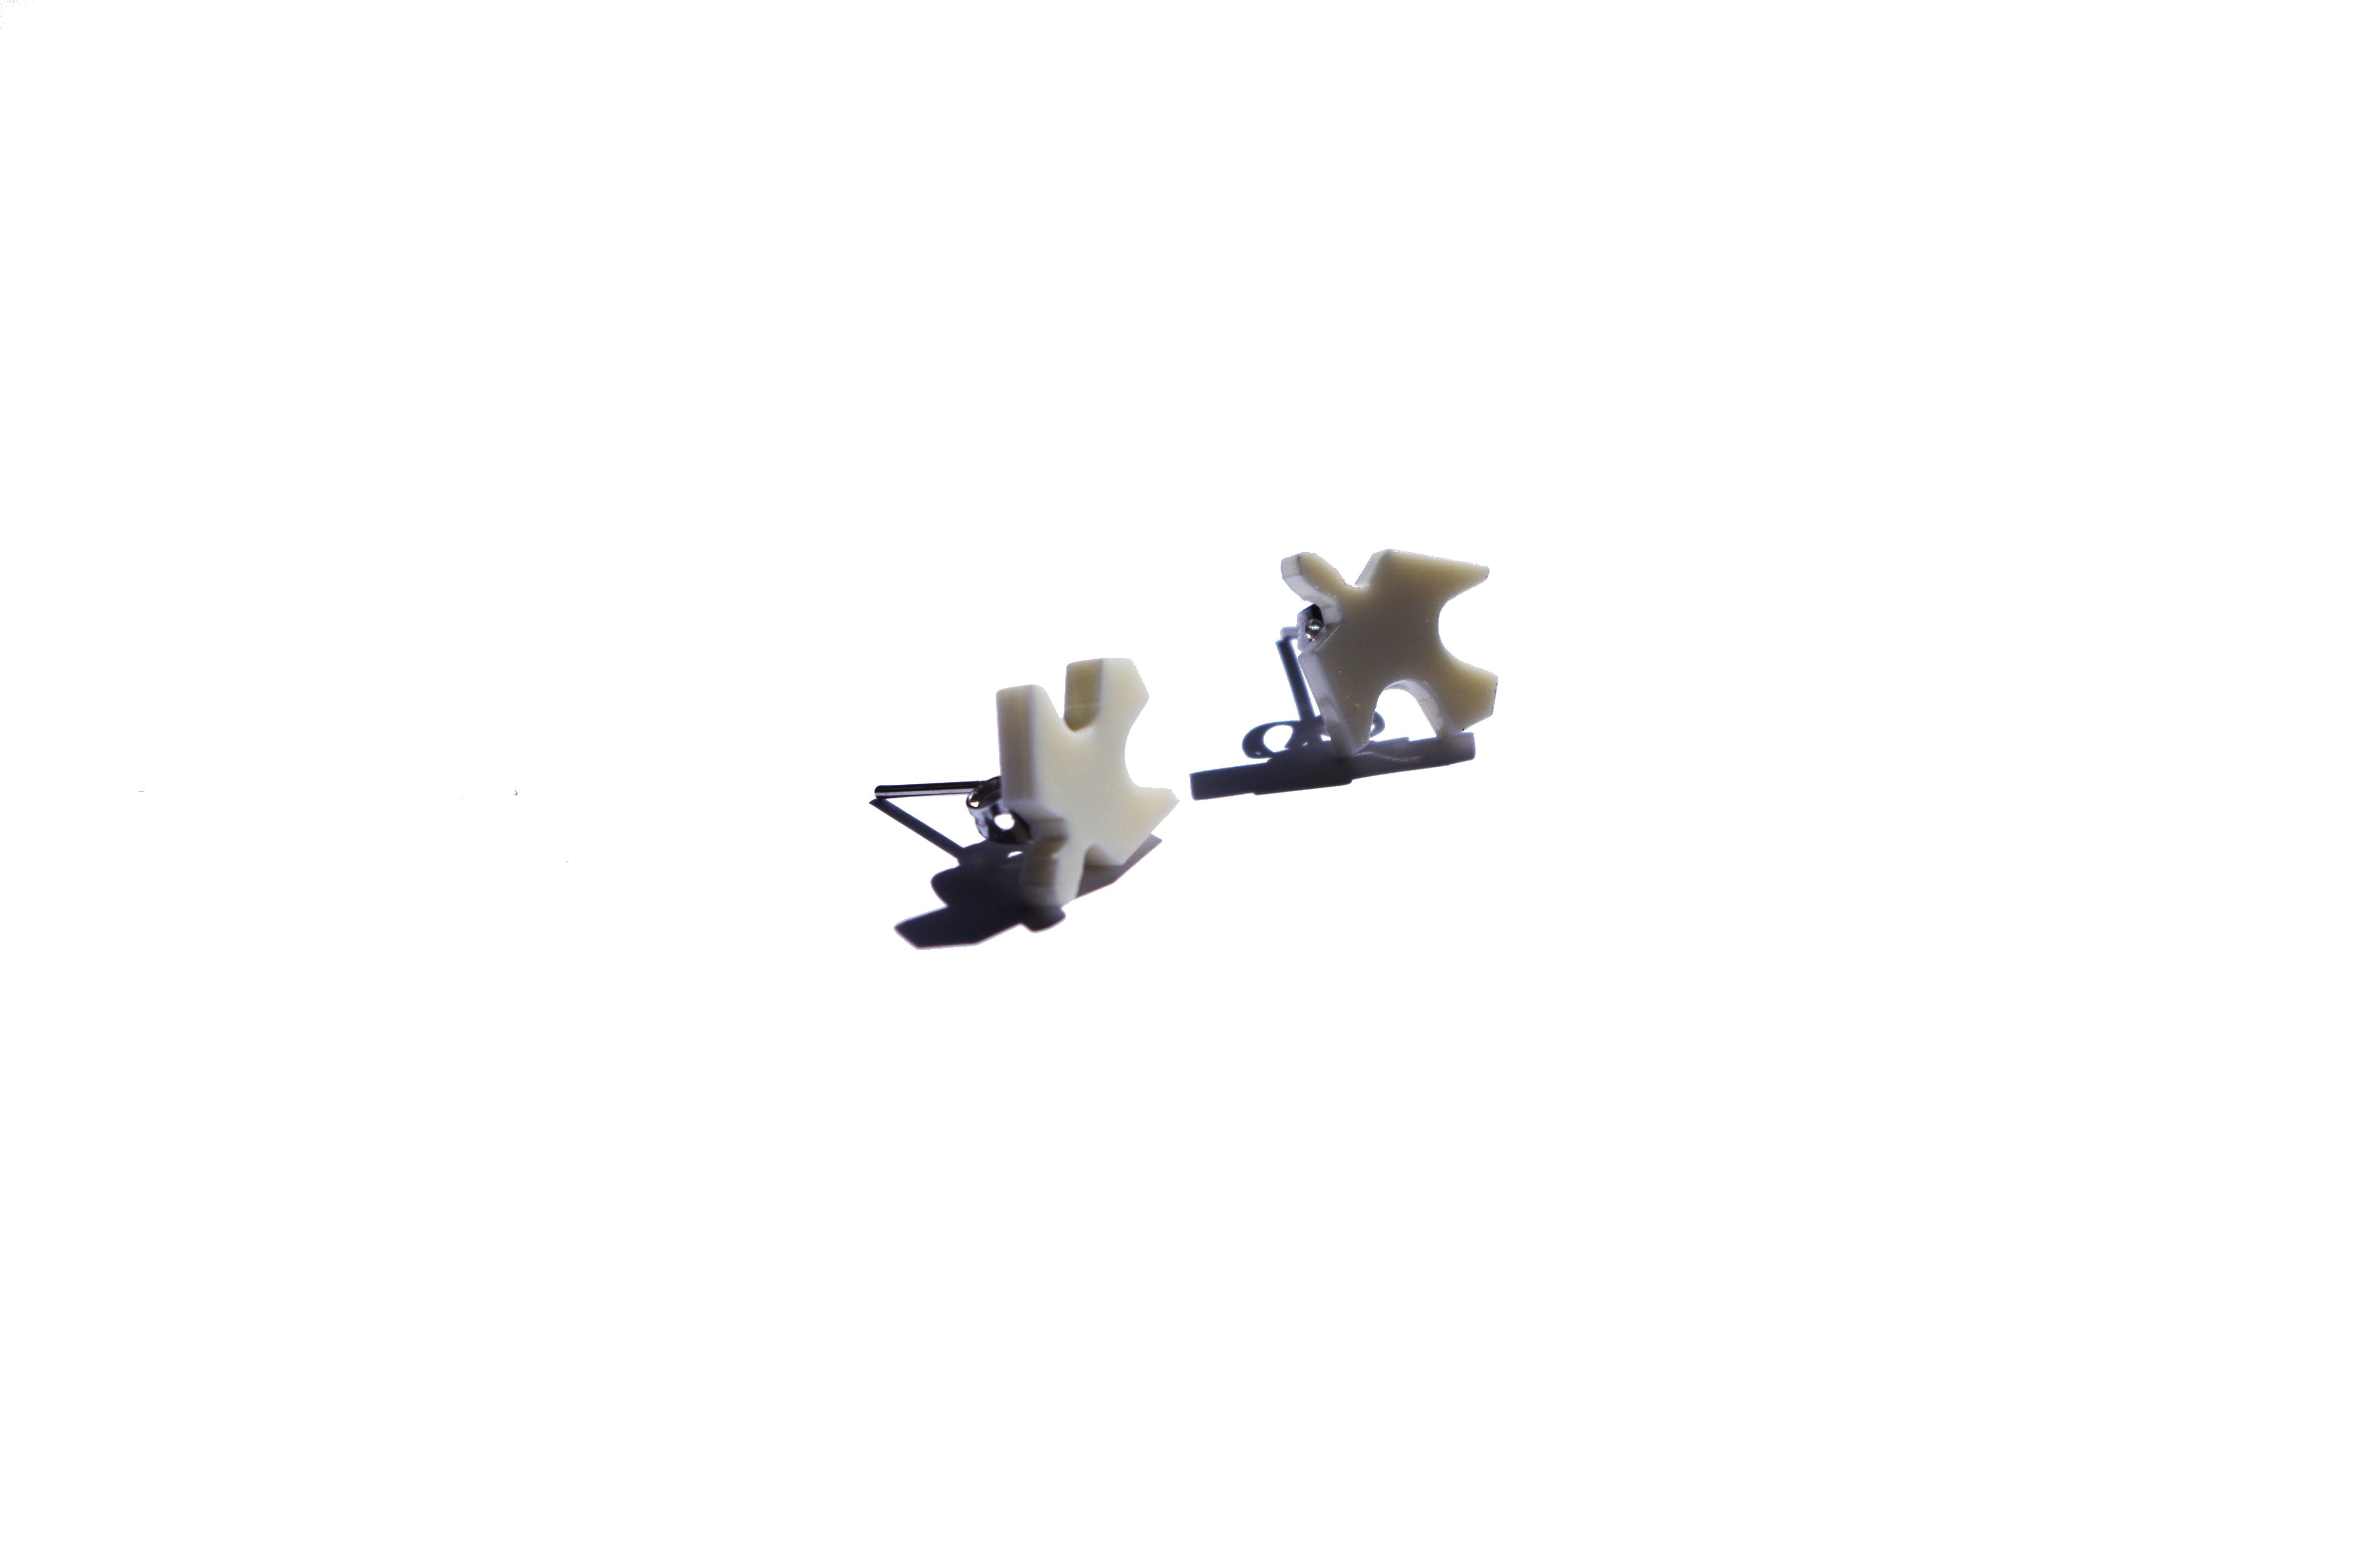 Boucle d'oreilles Colombe blanche